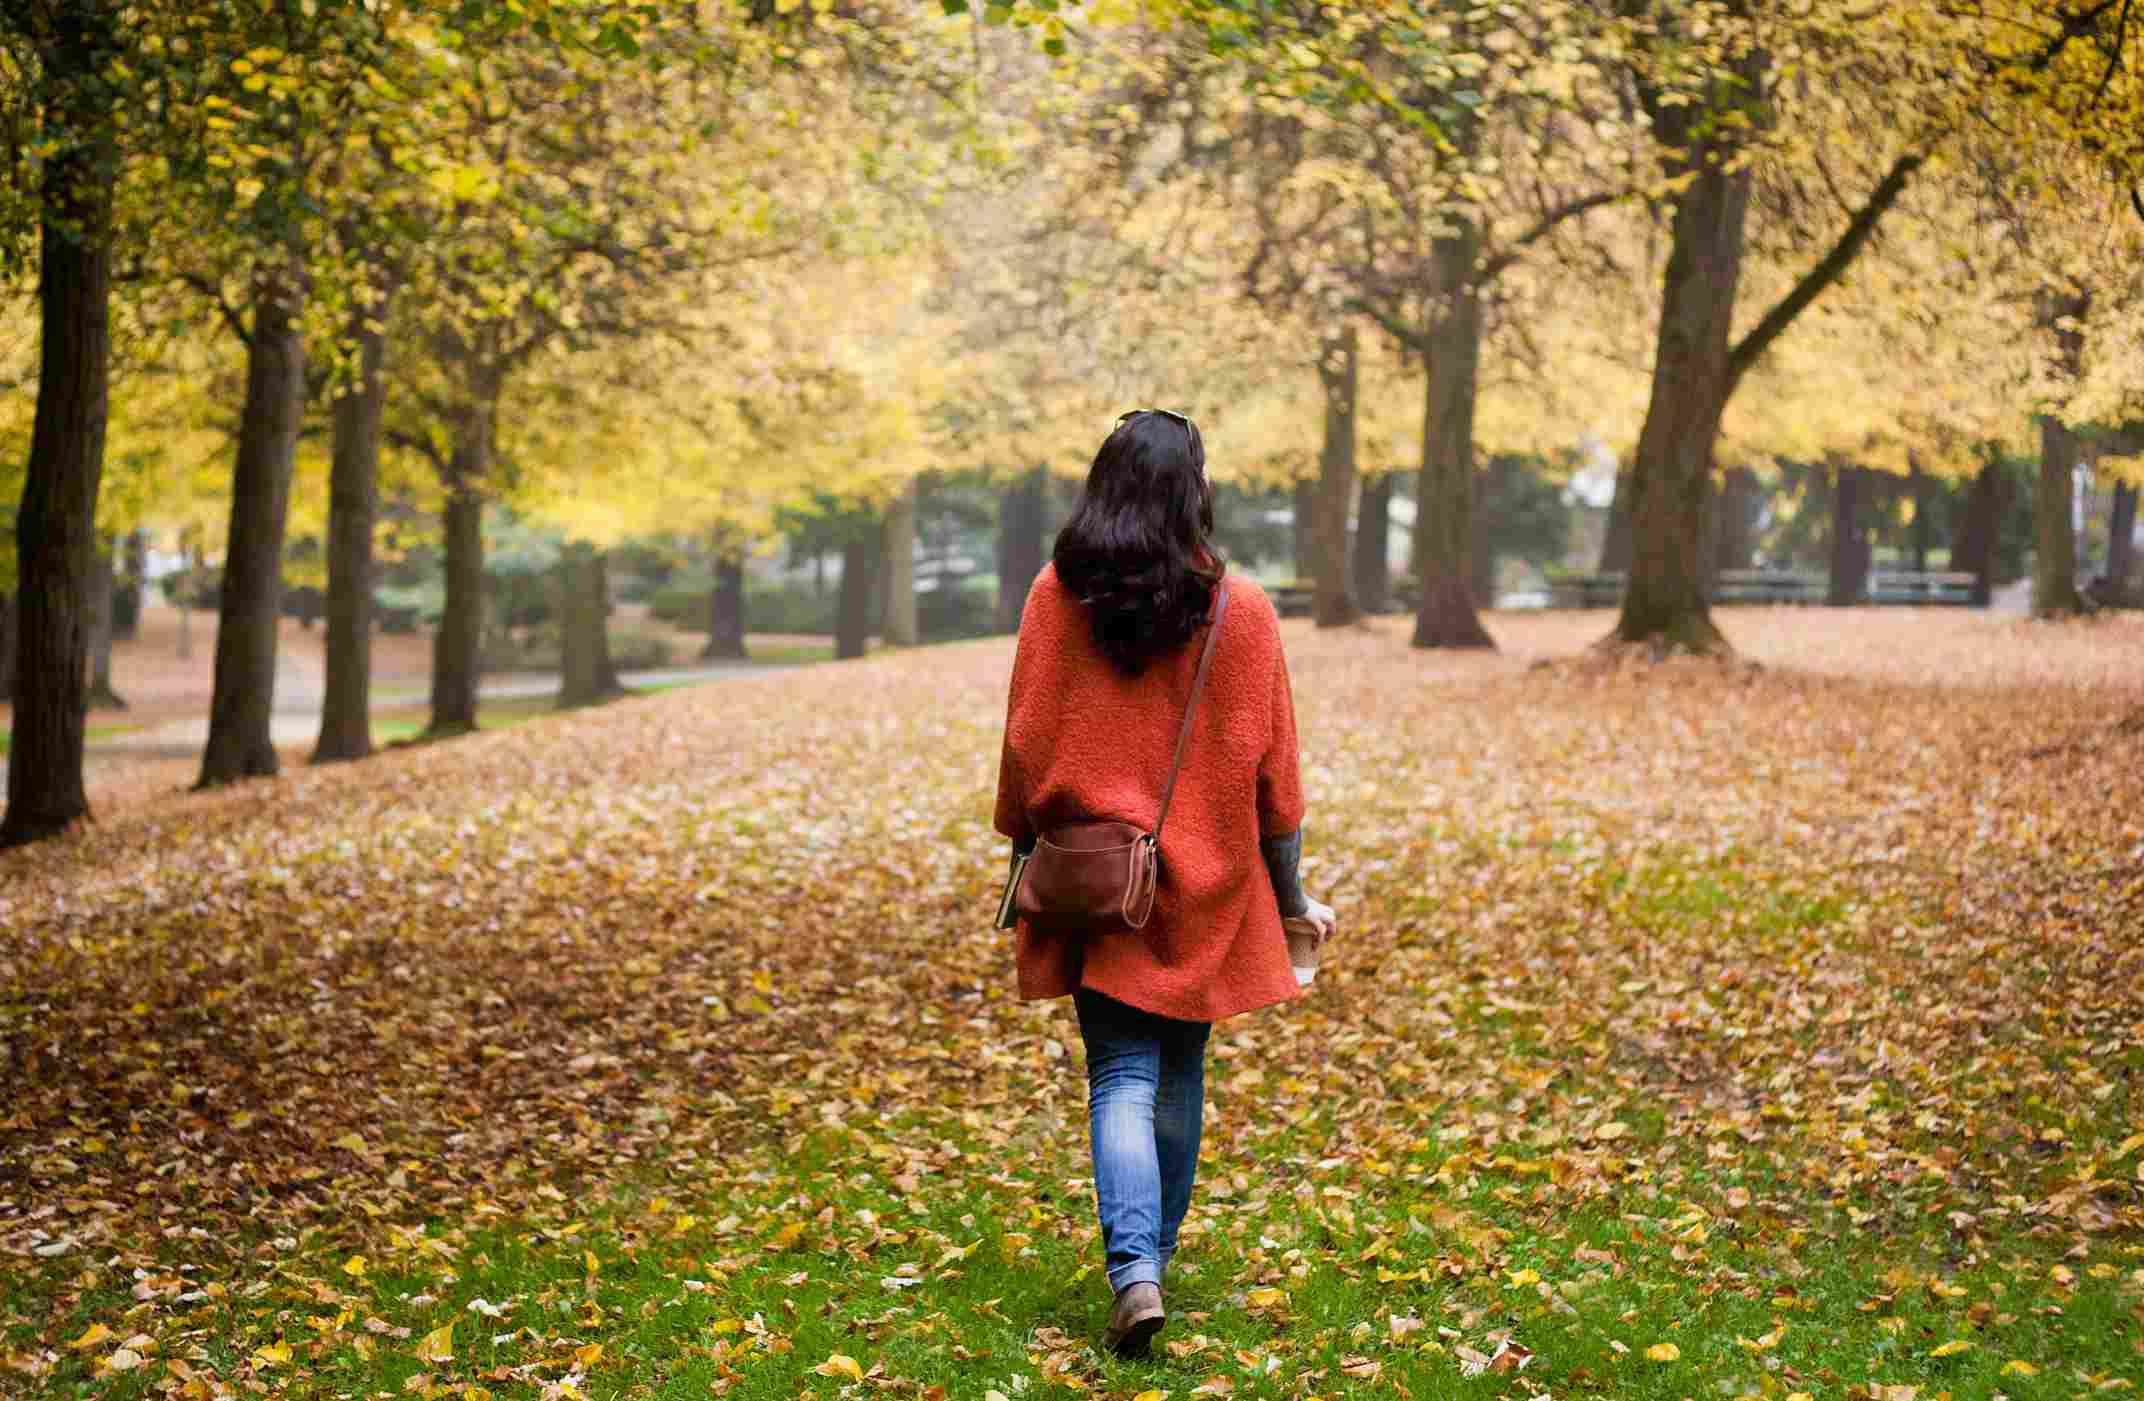 Woman walks alone through leaves